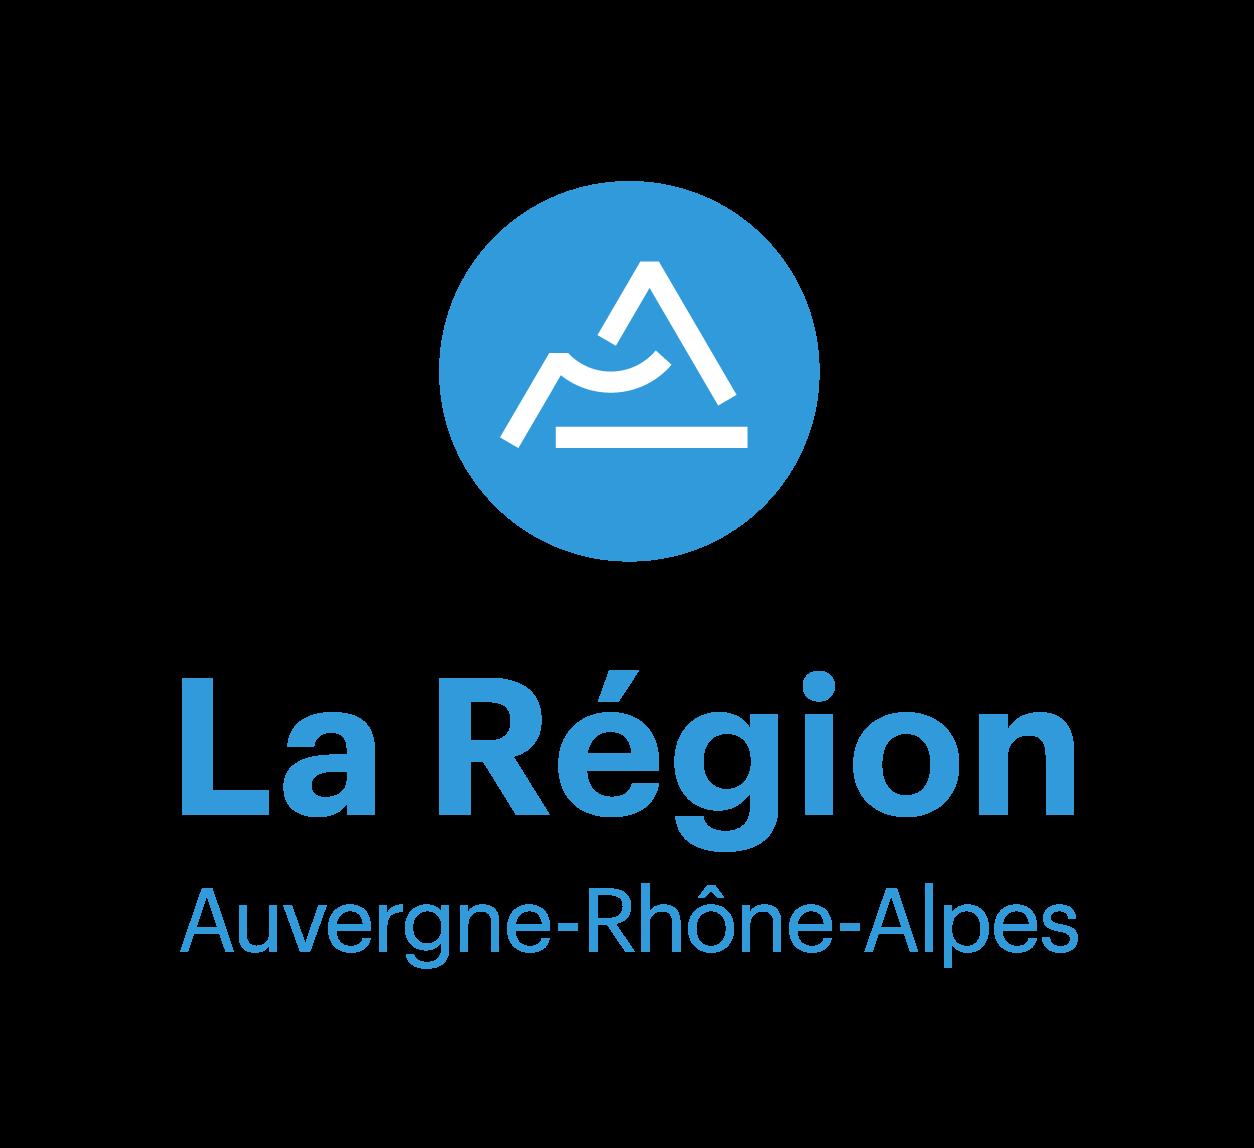 logo de REGION AUVERGNE-RHÔNE-ALPES